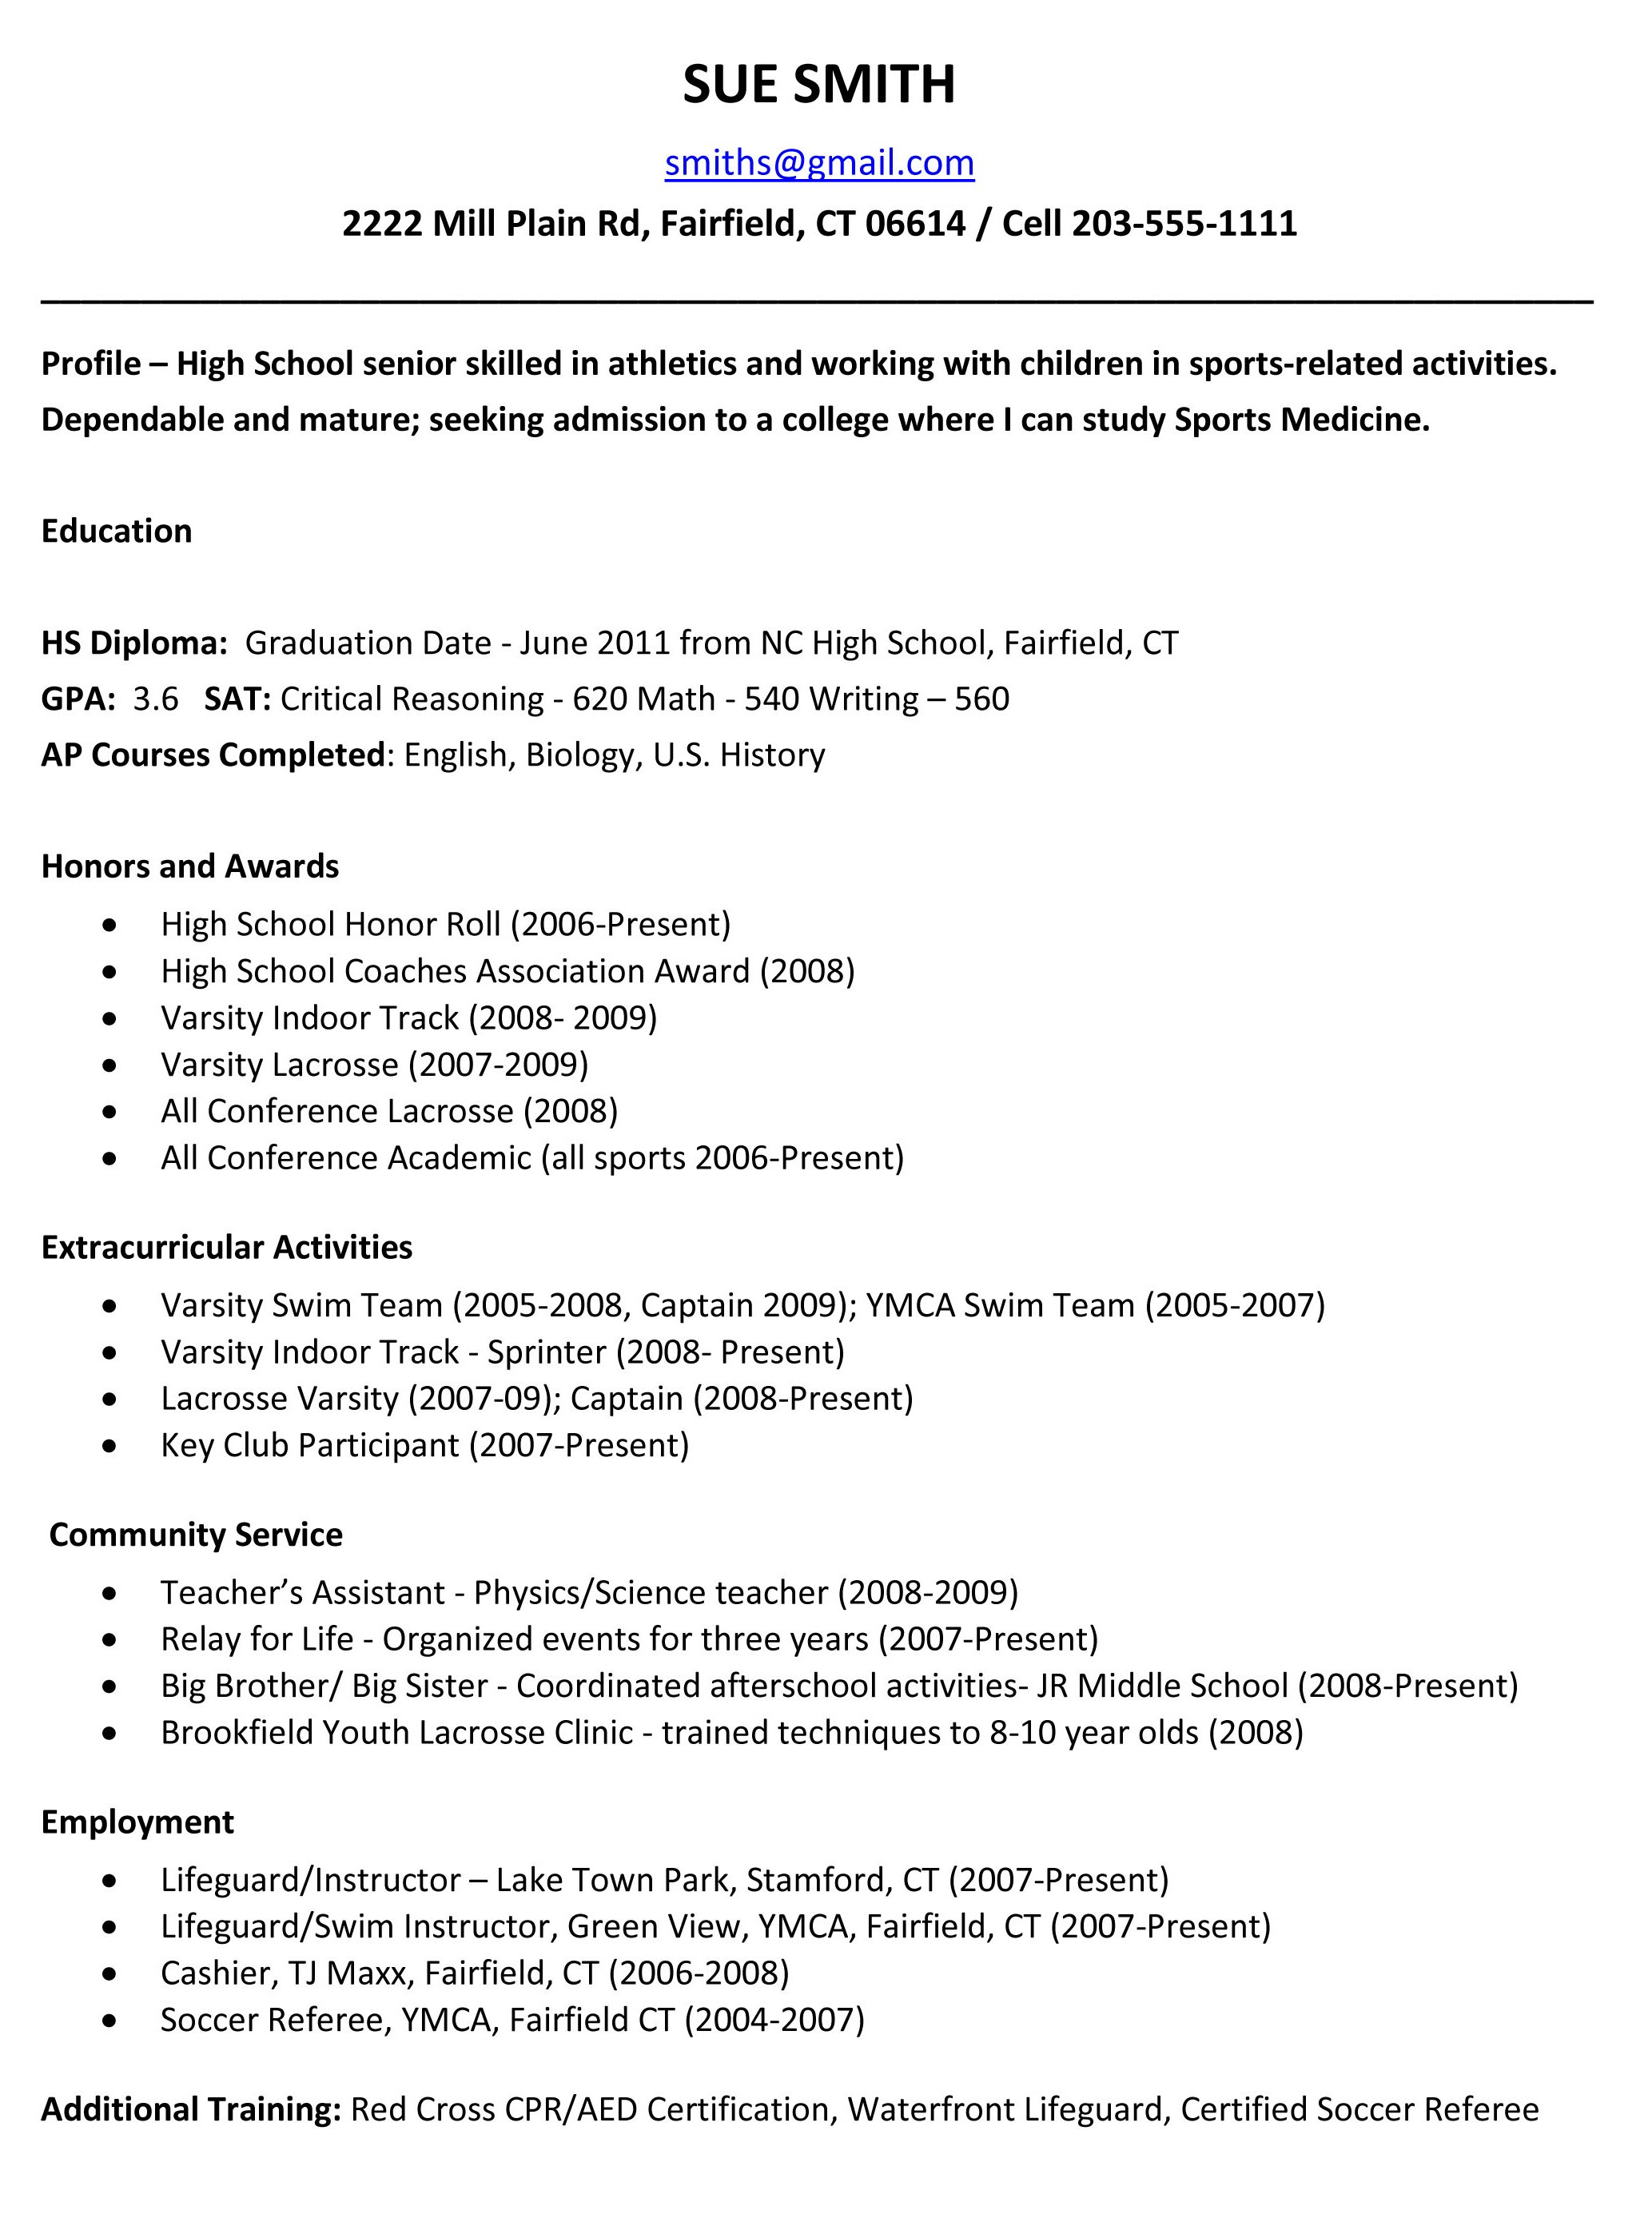 Resume Format Resume Samples High School